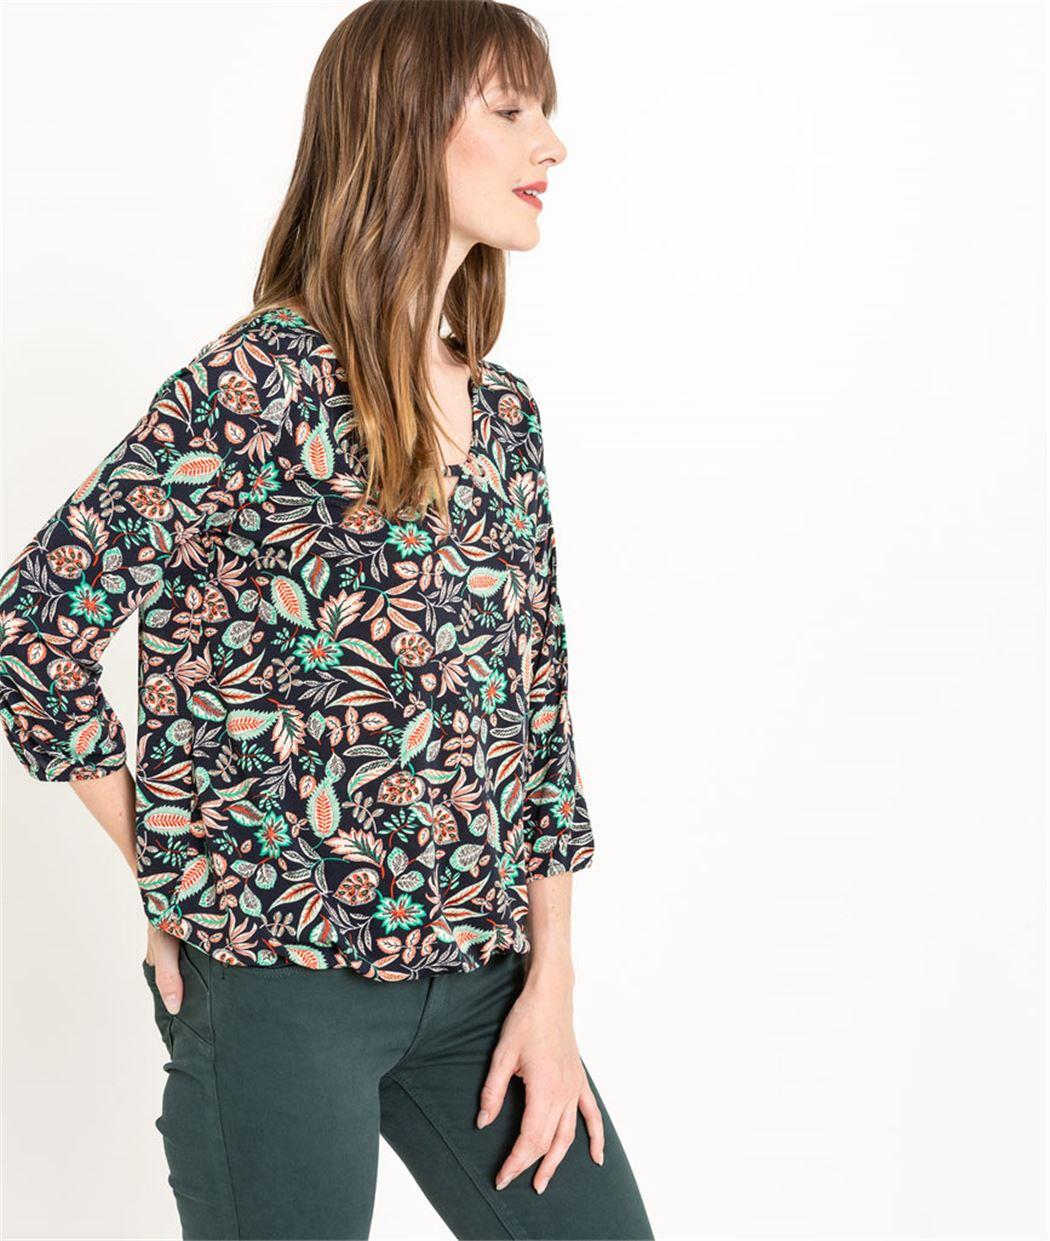 T-shirt femme imprimé tropical MARINE